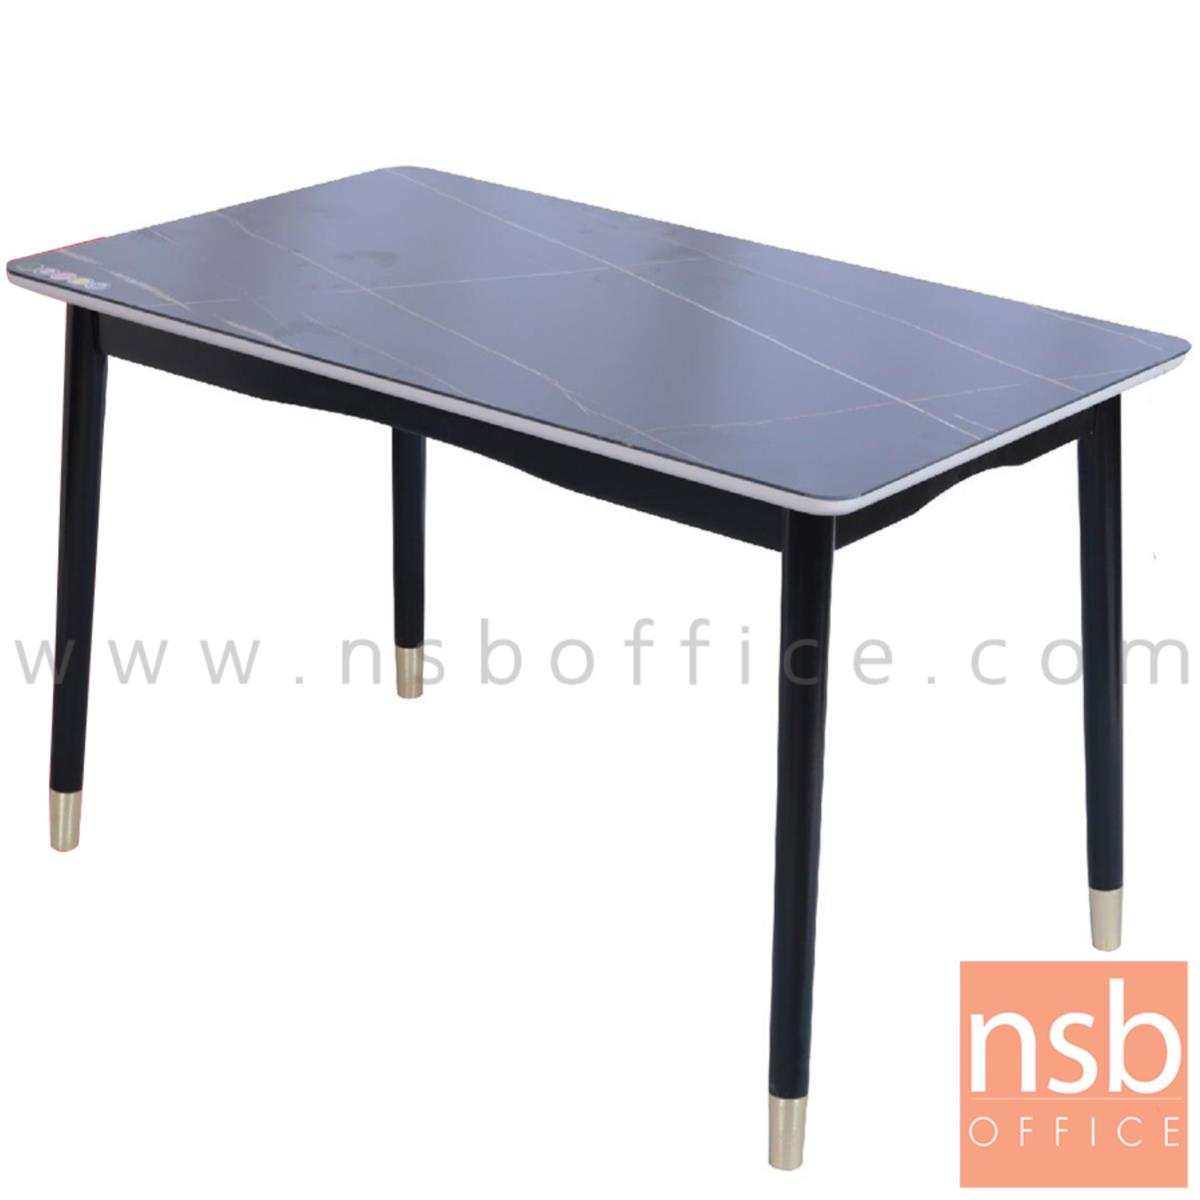 G14A219:โต๊ะรับประทานอาหาร รุ่น Bellagio (เบลลาโจ) ขนาด 120W cm. หน้ากระจกลายหินอ่อน ขาไม้